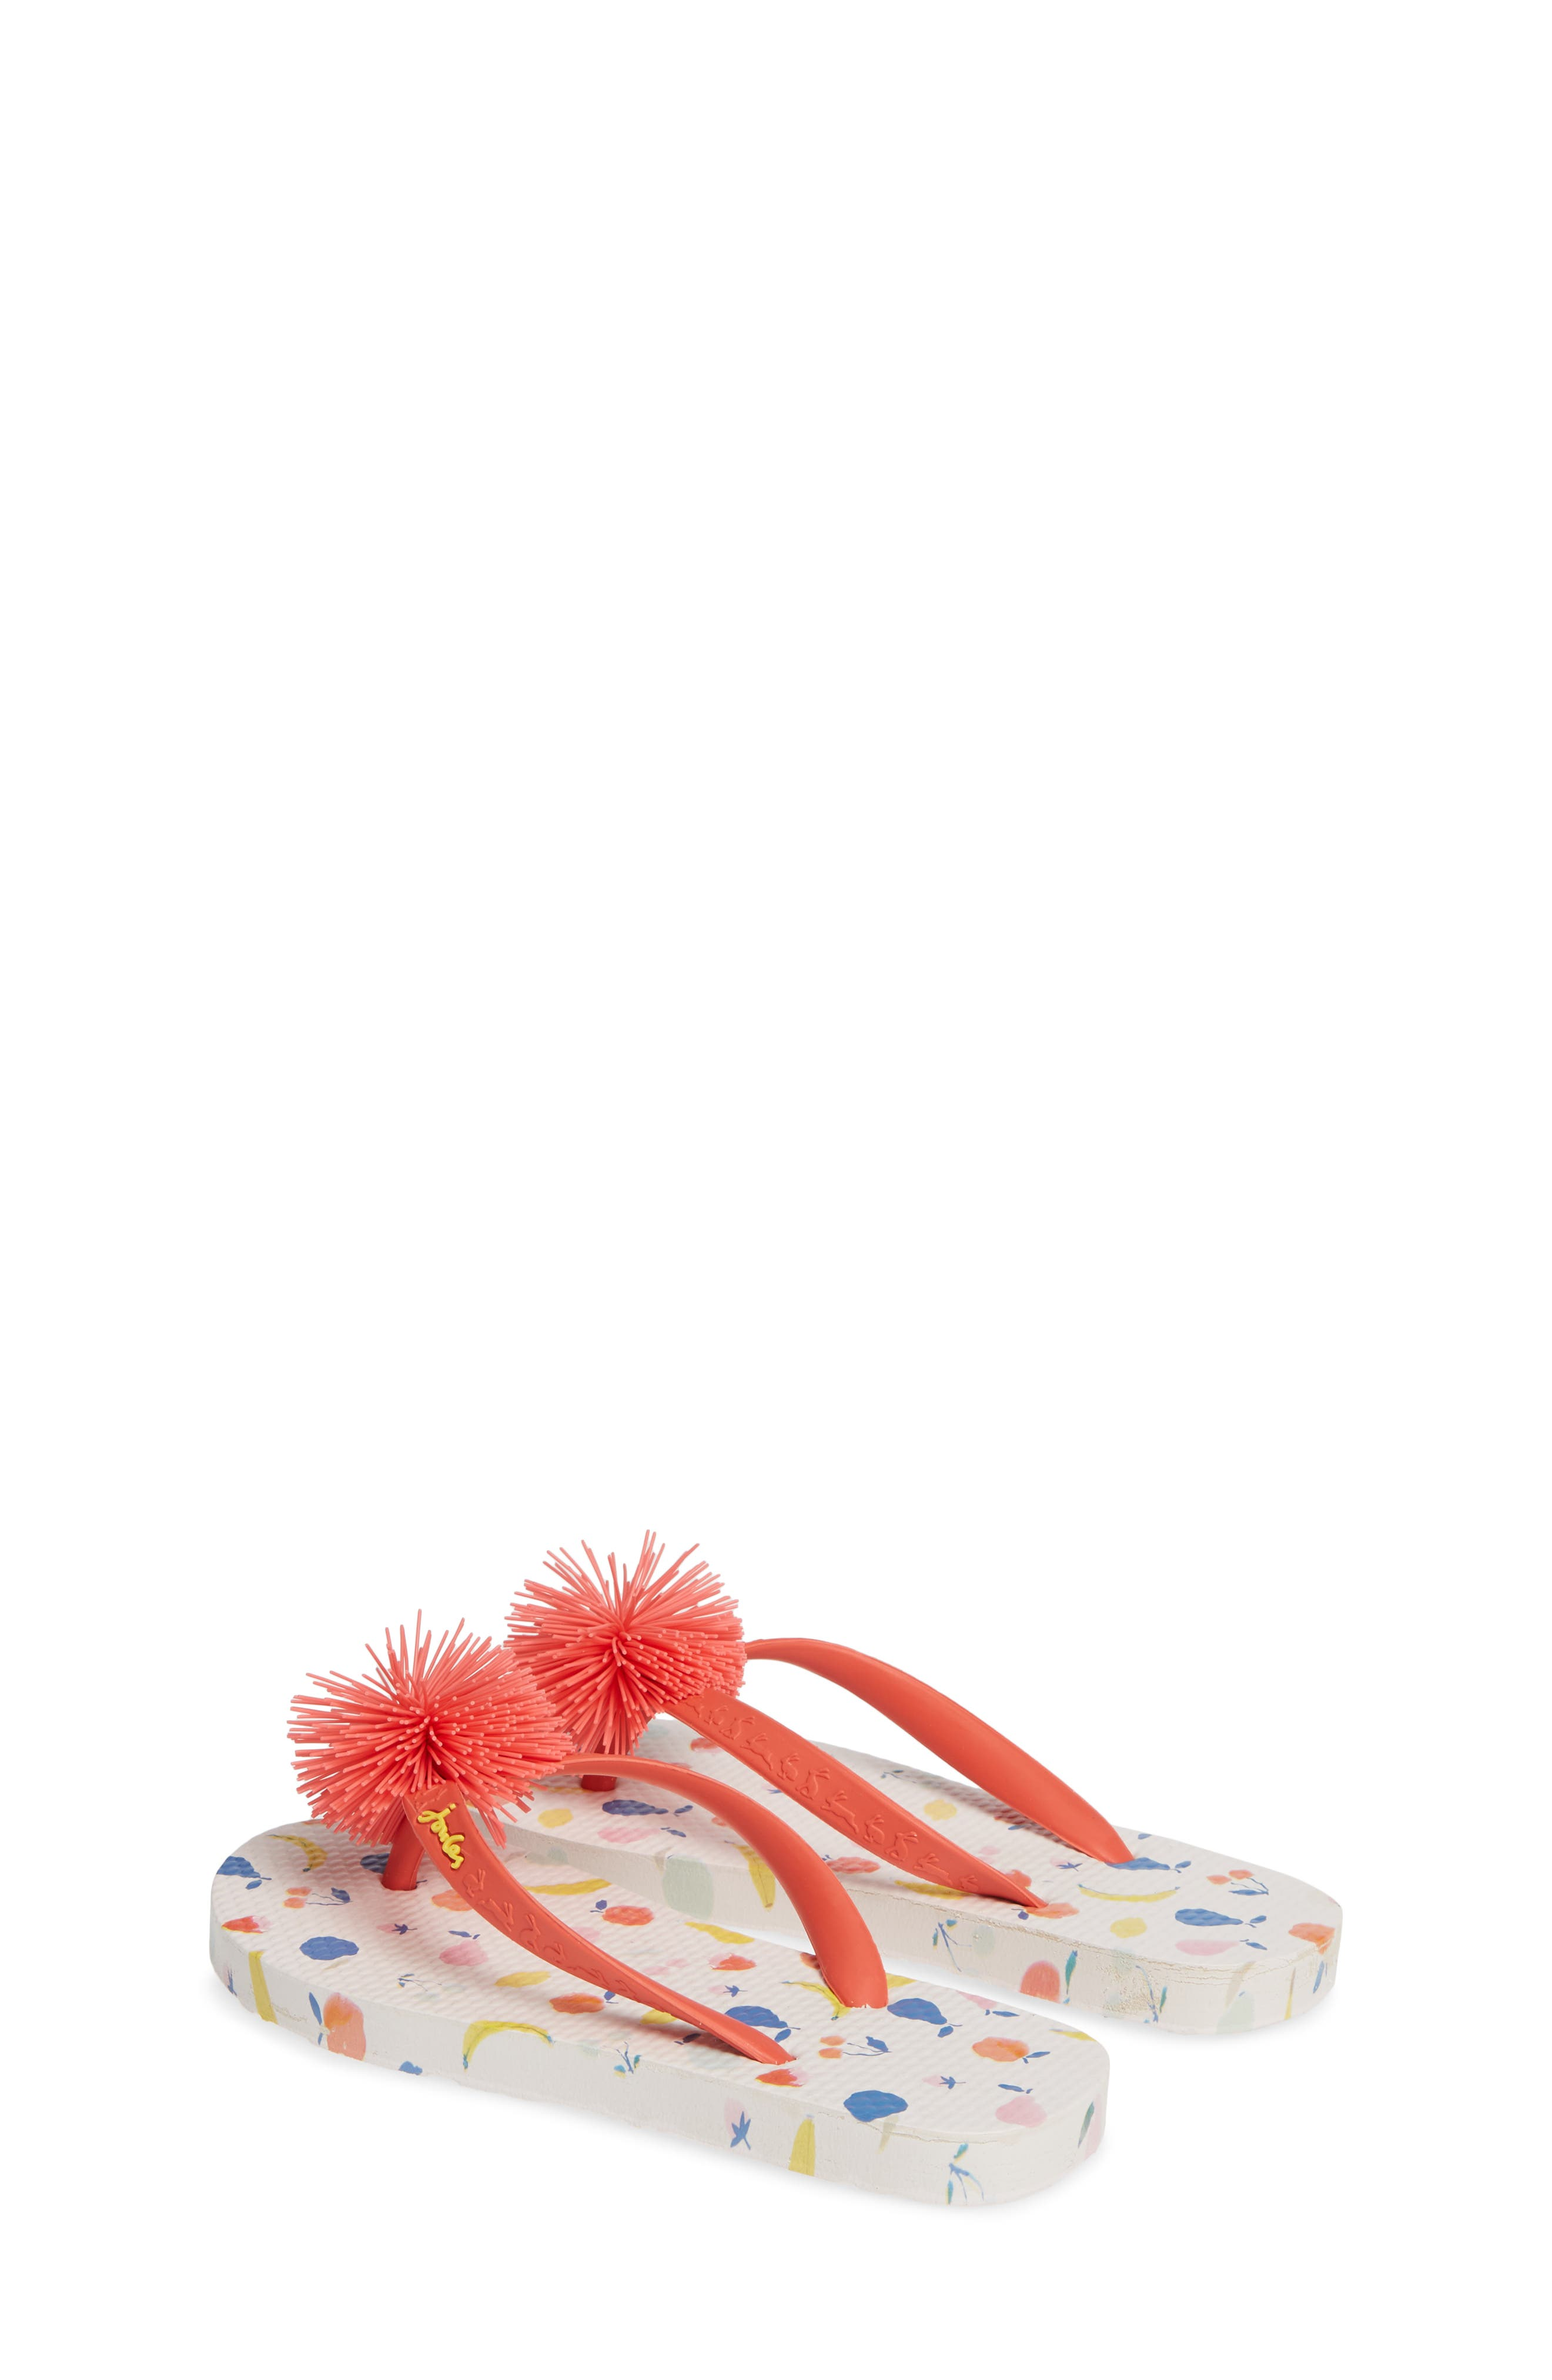 JOULES, Embellished Flip Flop, Alternate thumbnail 3, color, WHITE PETALS